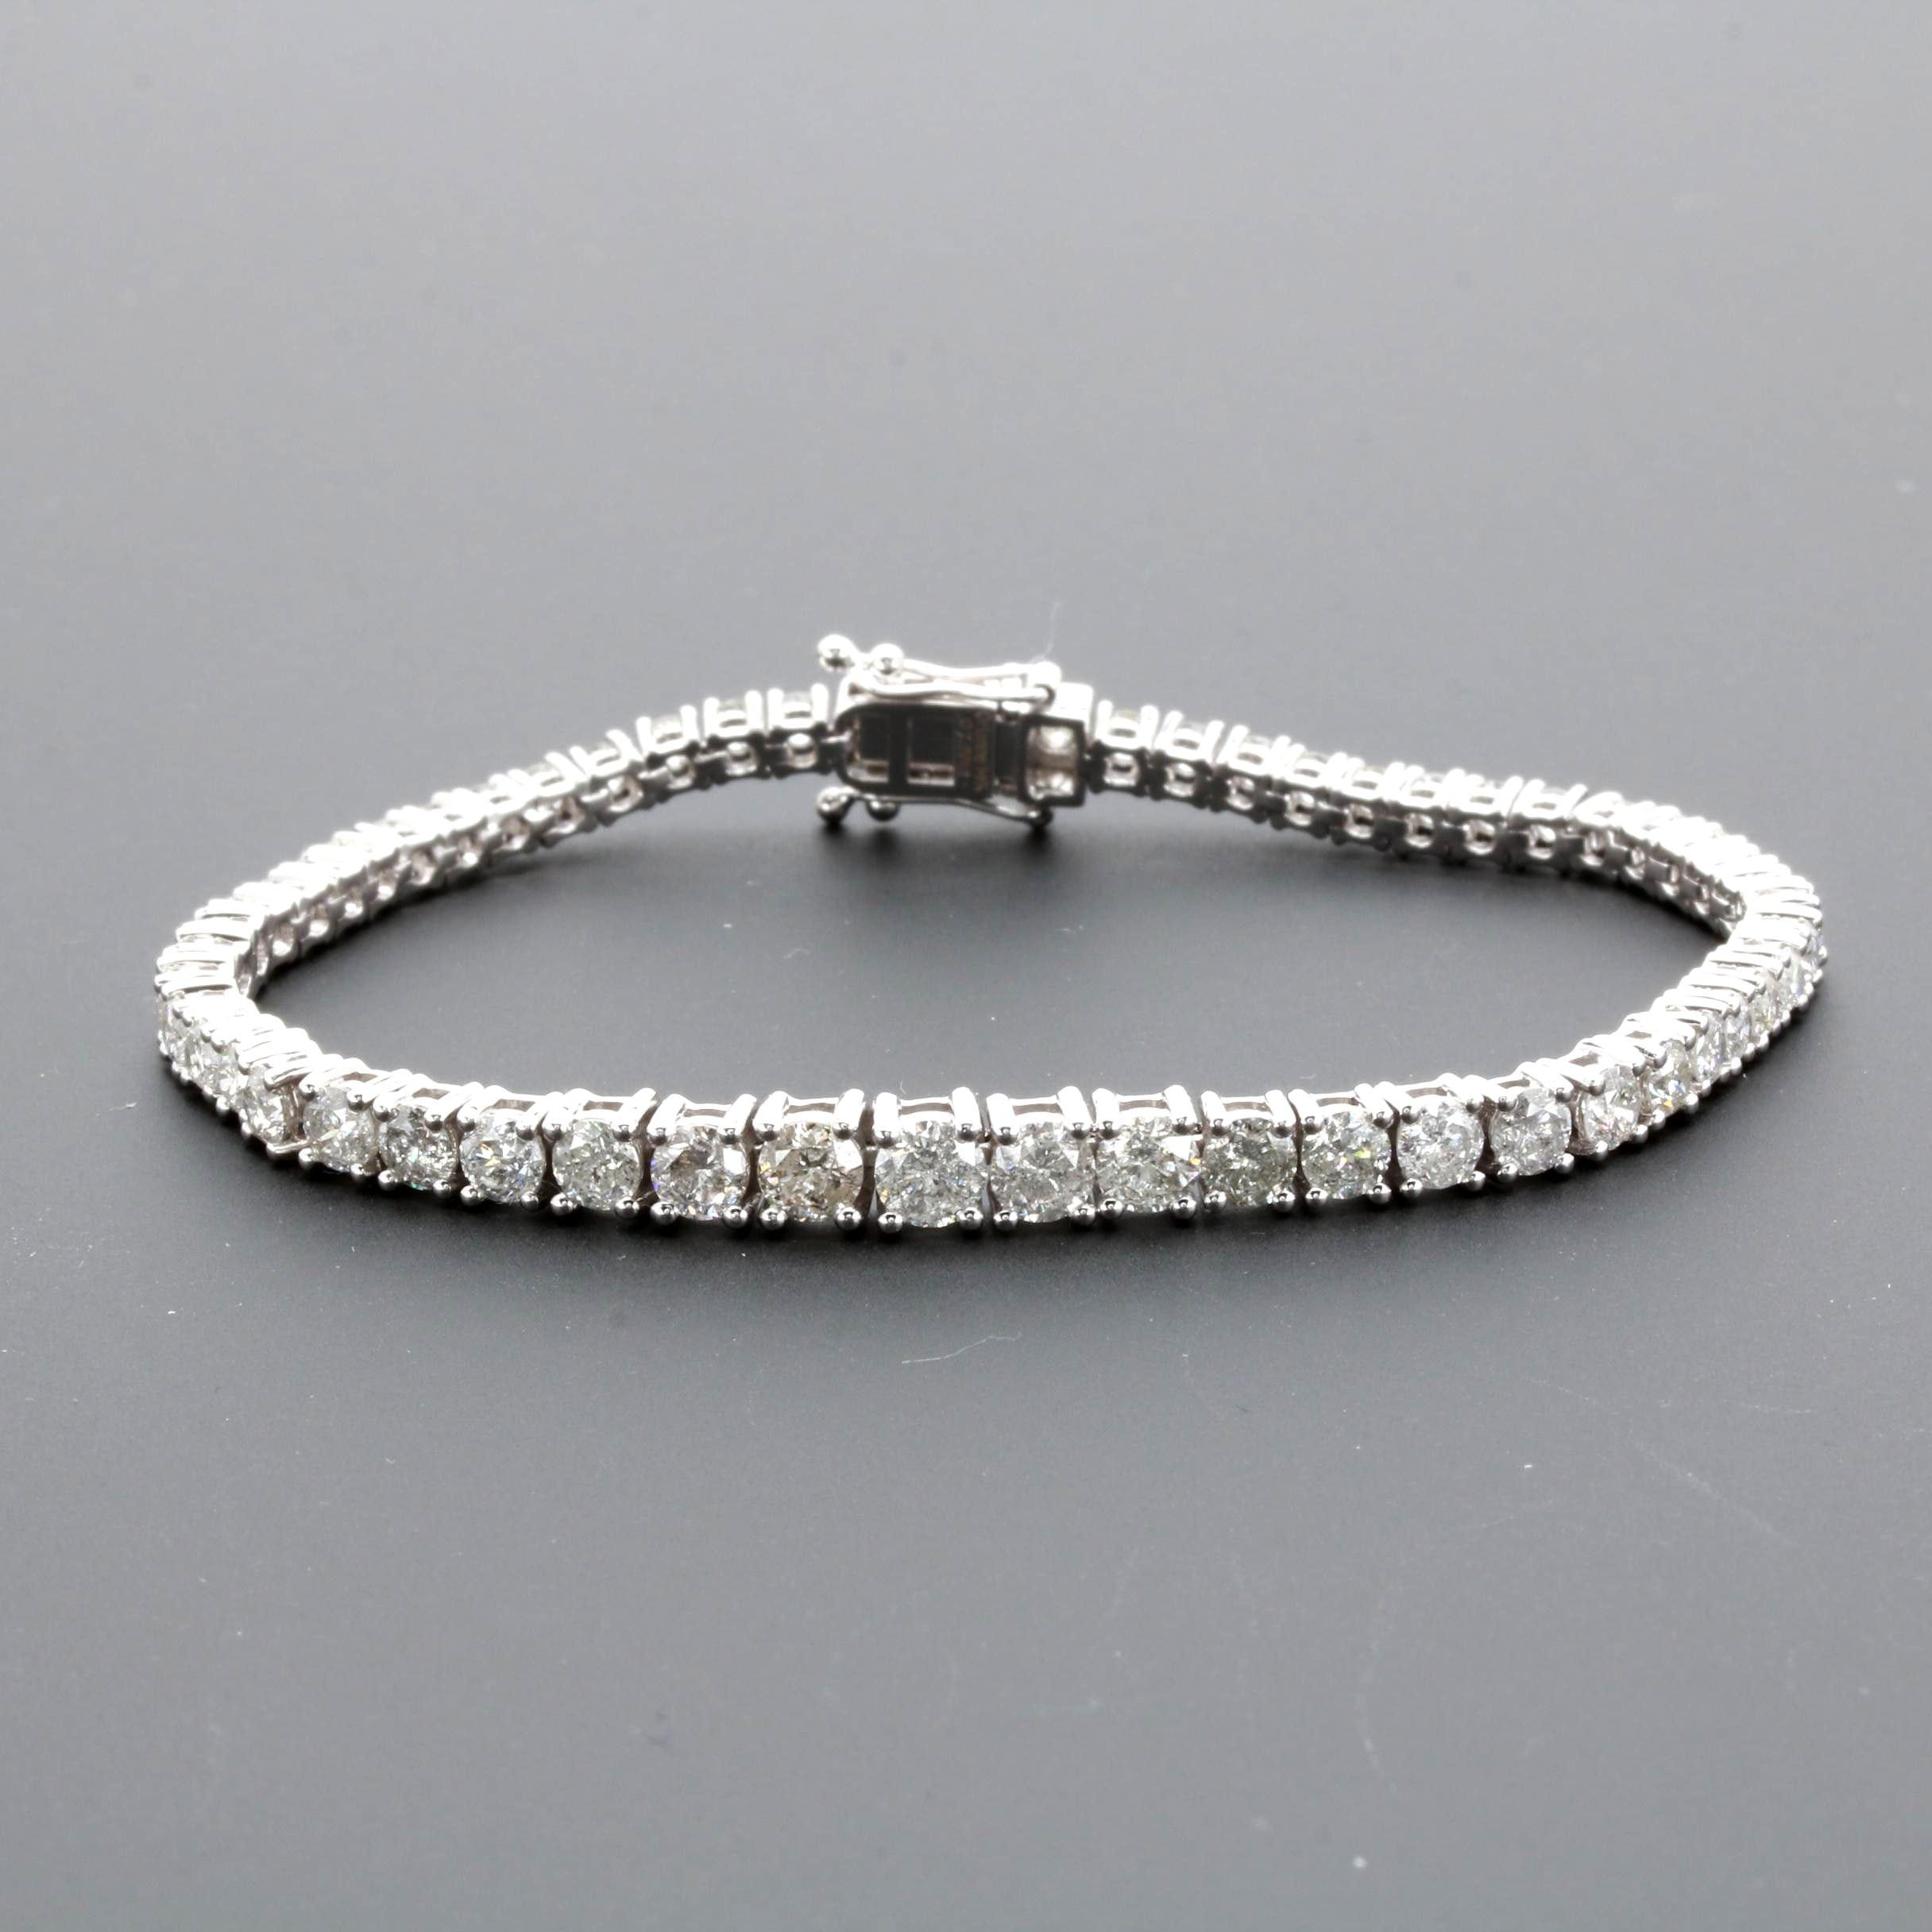 14K White Gold 7.59 CTW Diamond Graduating Tennis Bracelet